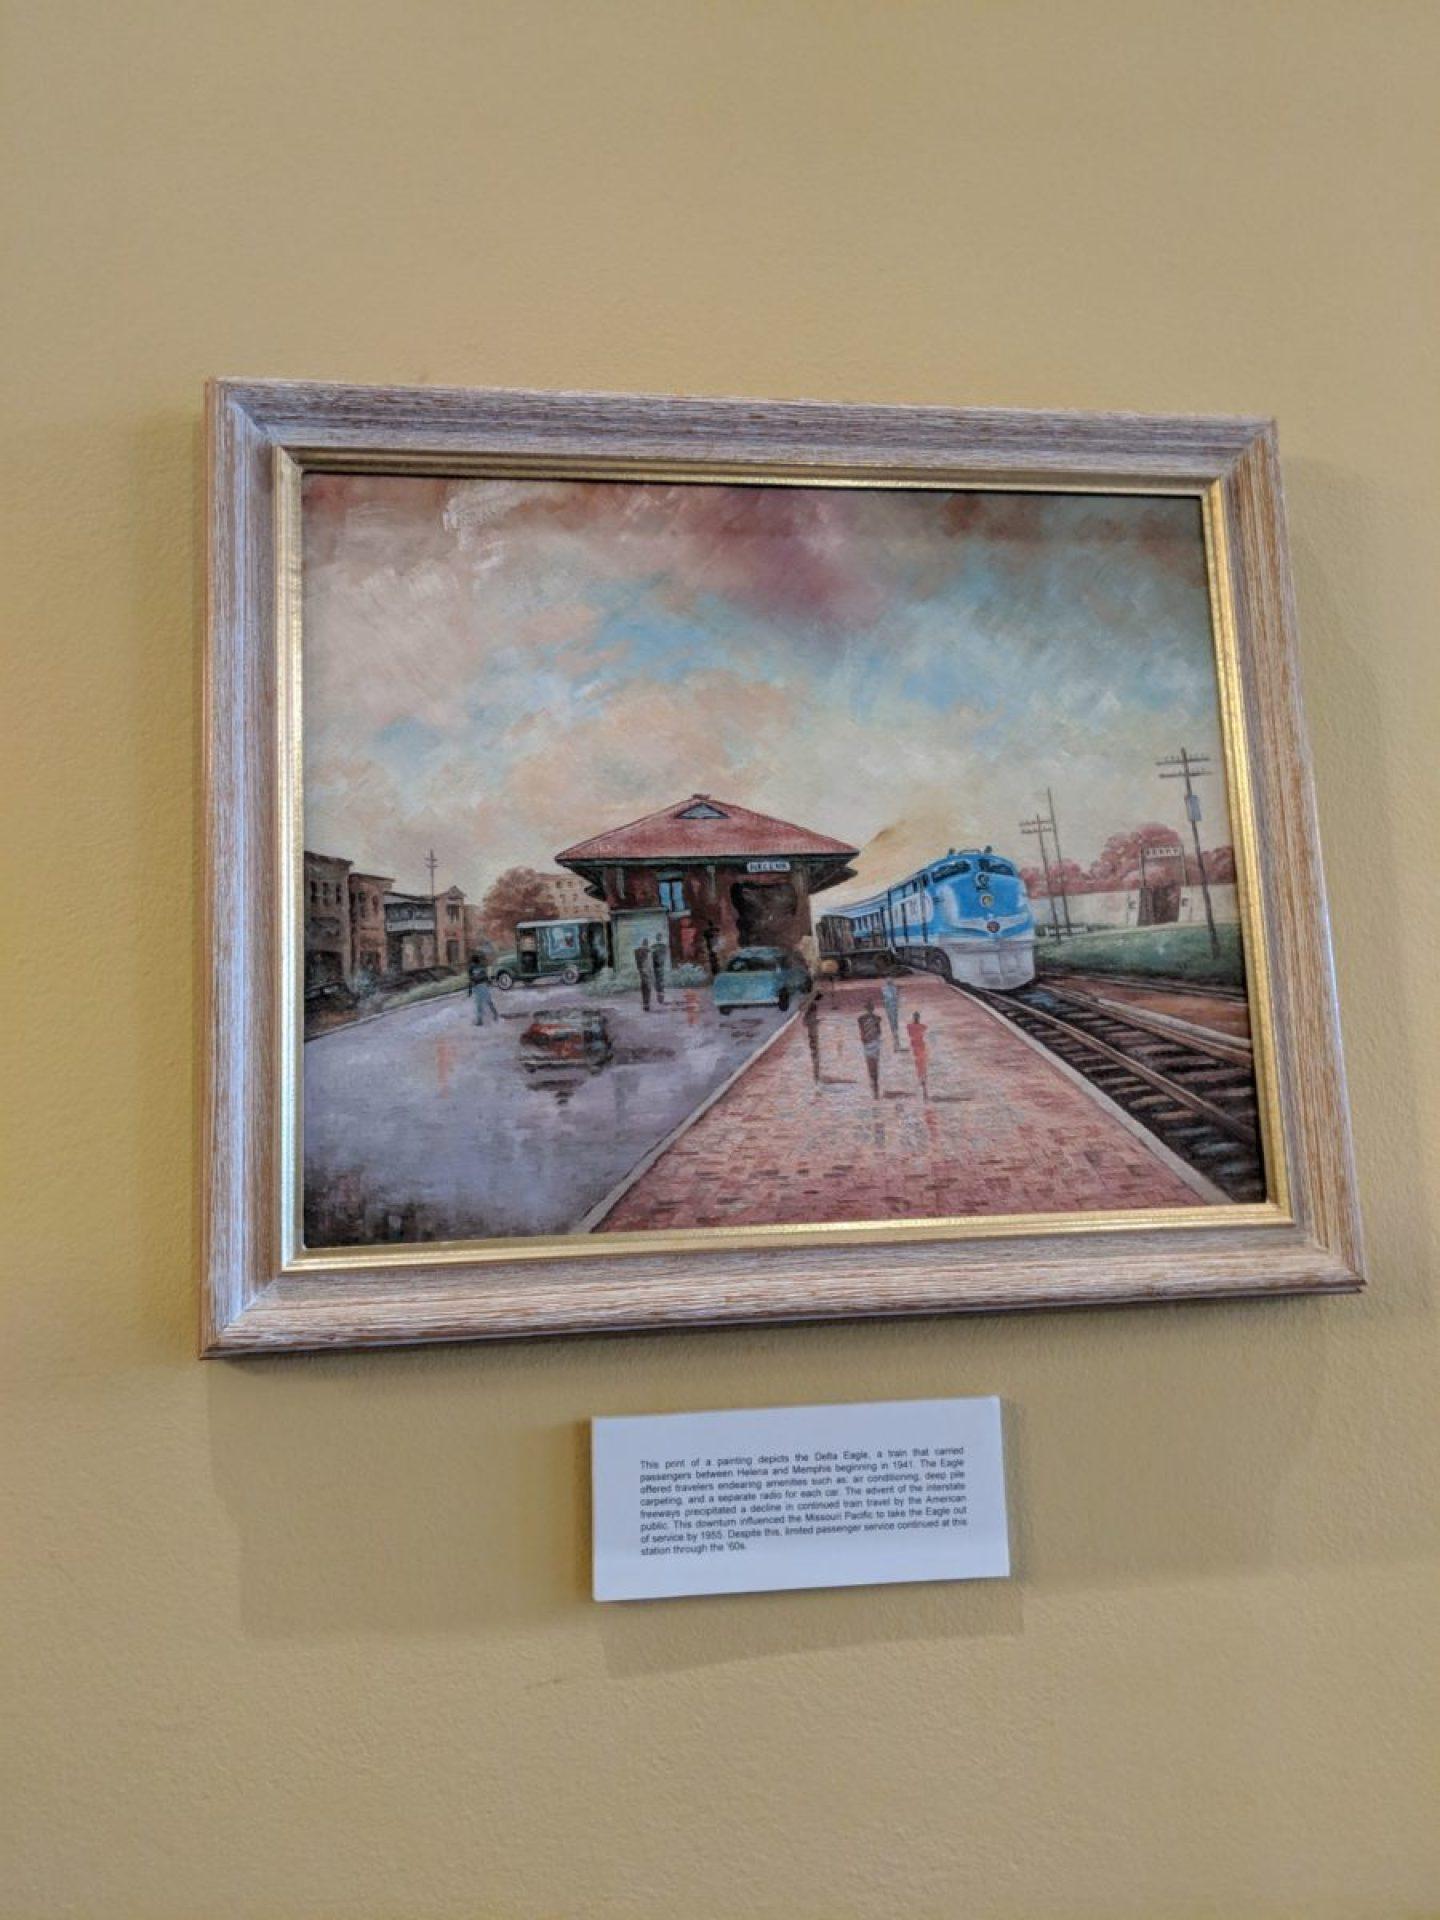 IMG_20190503_114214-1440x1920 Arkansas Delta Family Road Trip:  Black Heritage, Art & More!